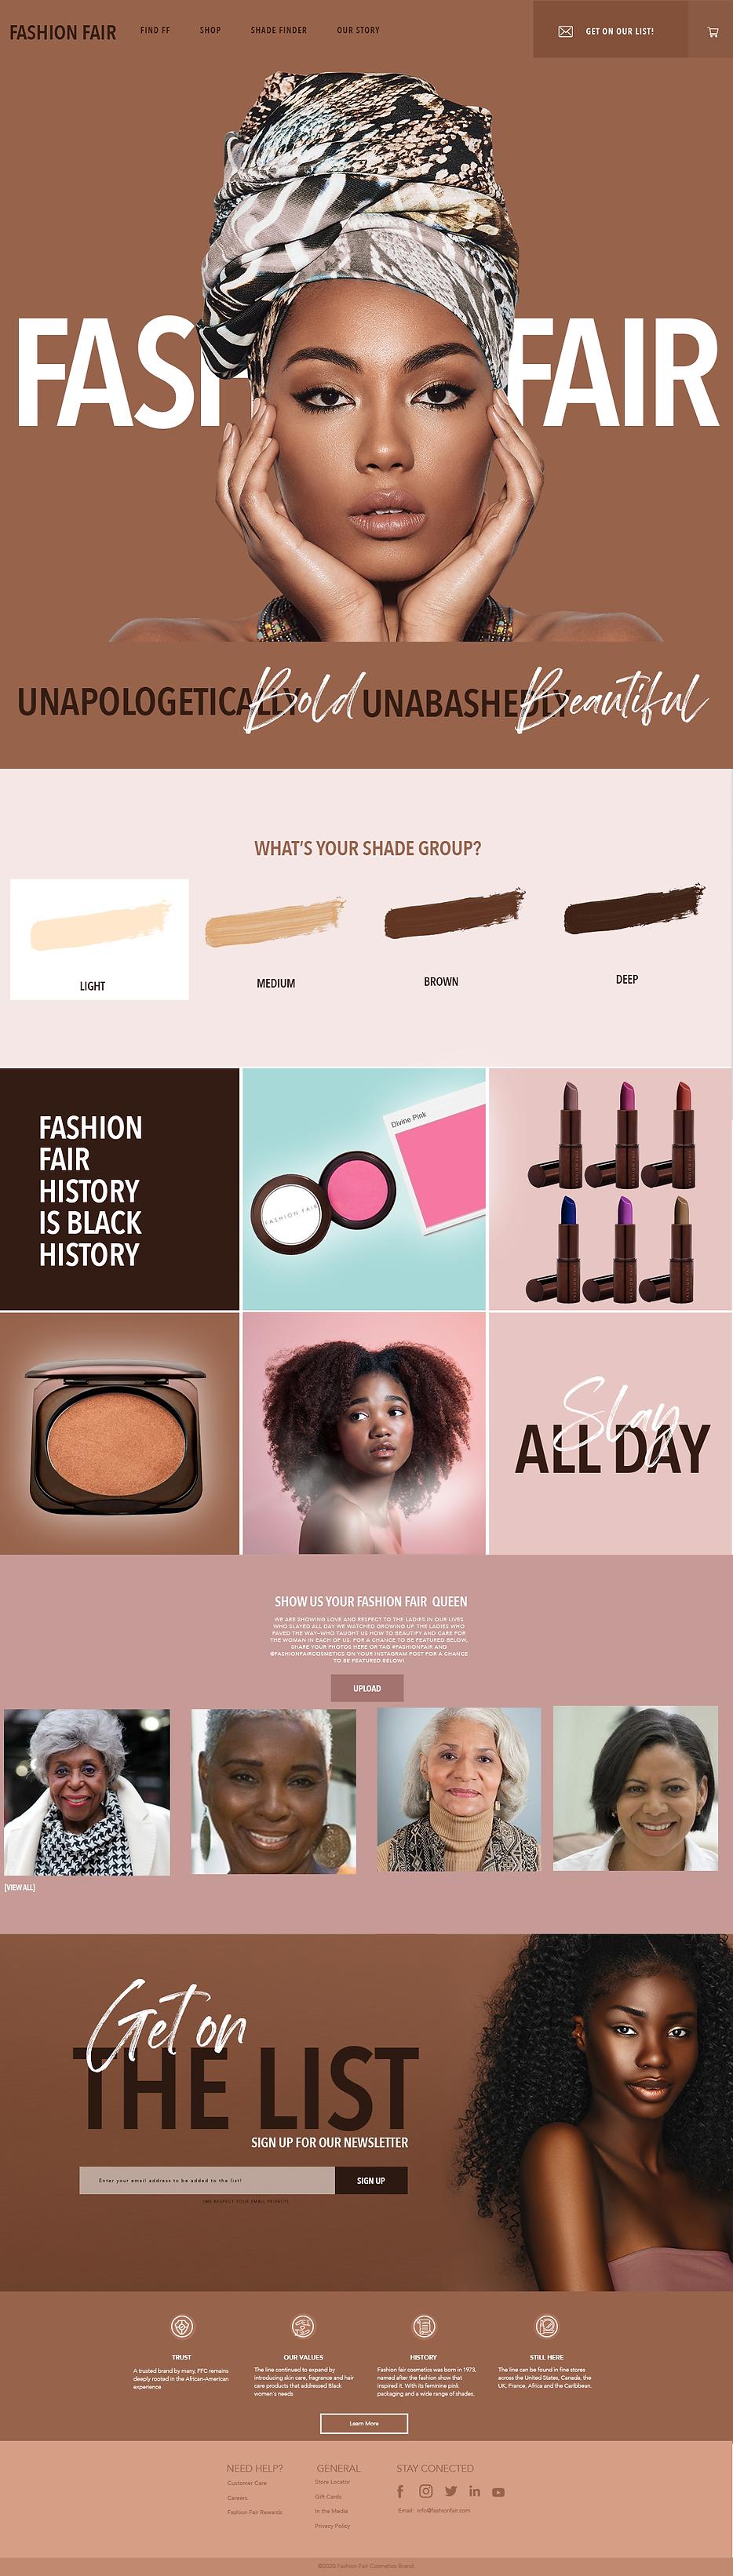 20200107_FashionFair_SiteMockup_1-copy.p